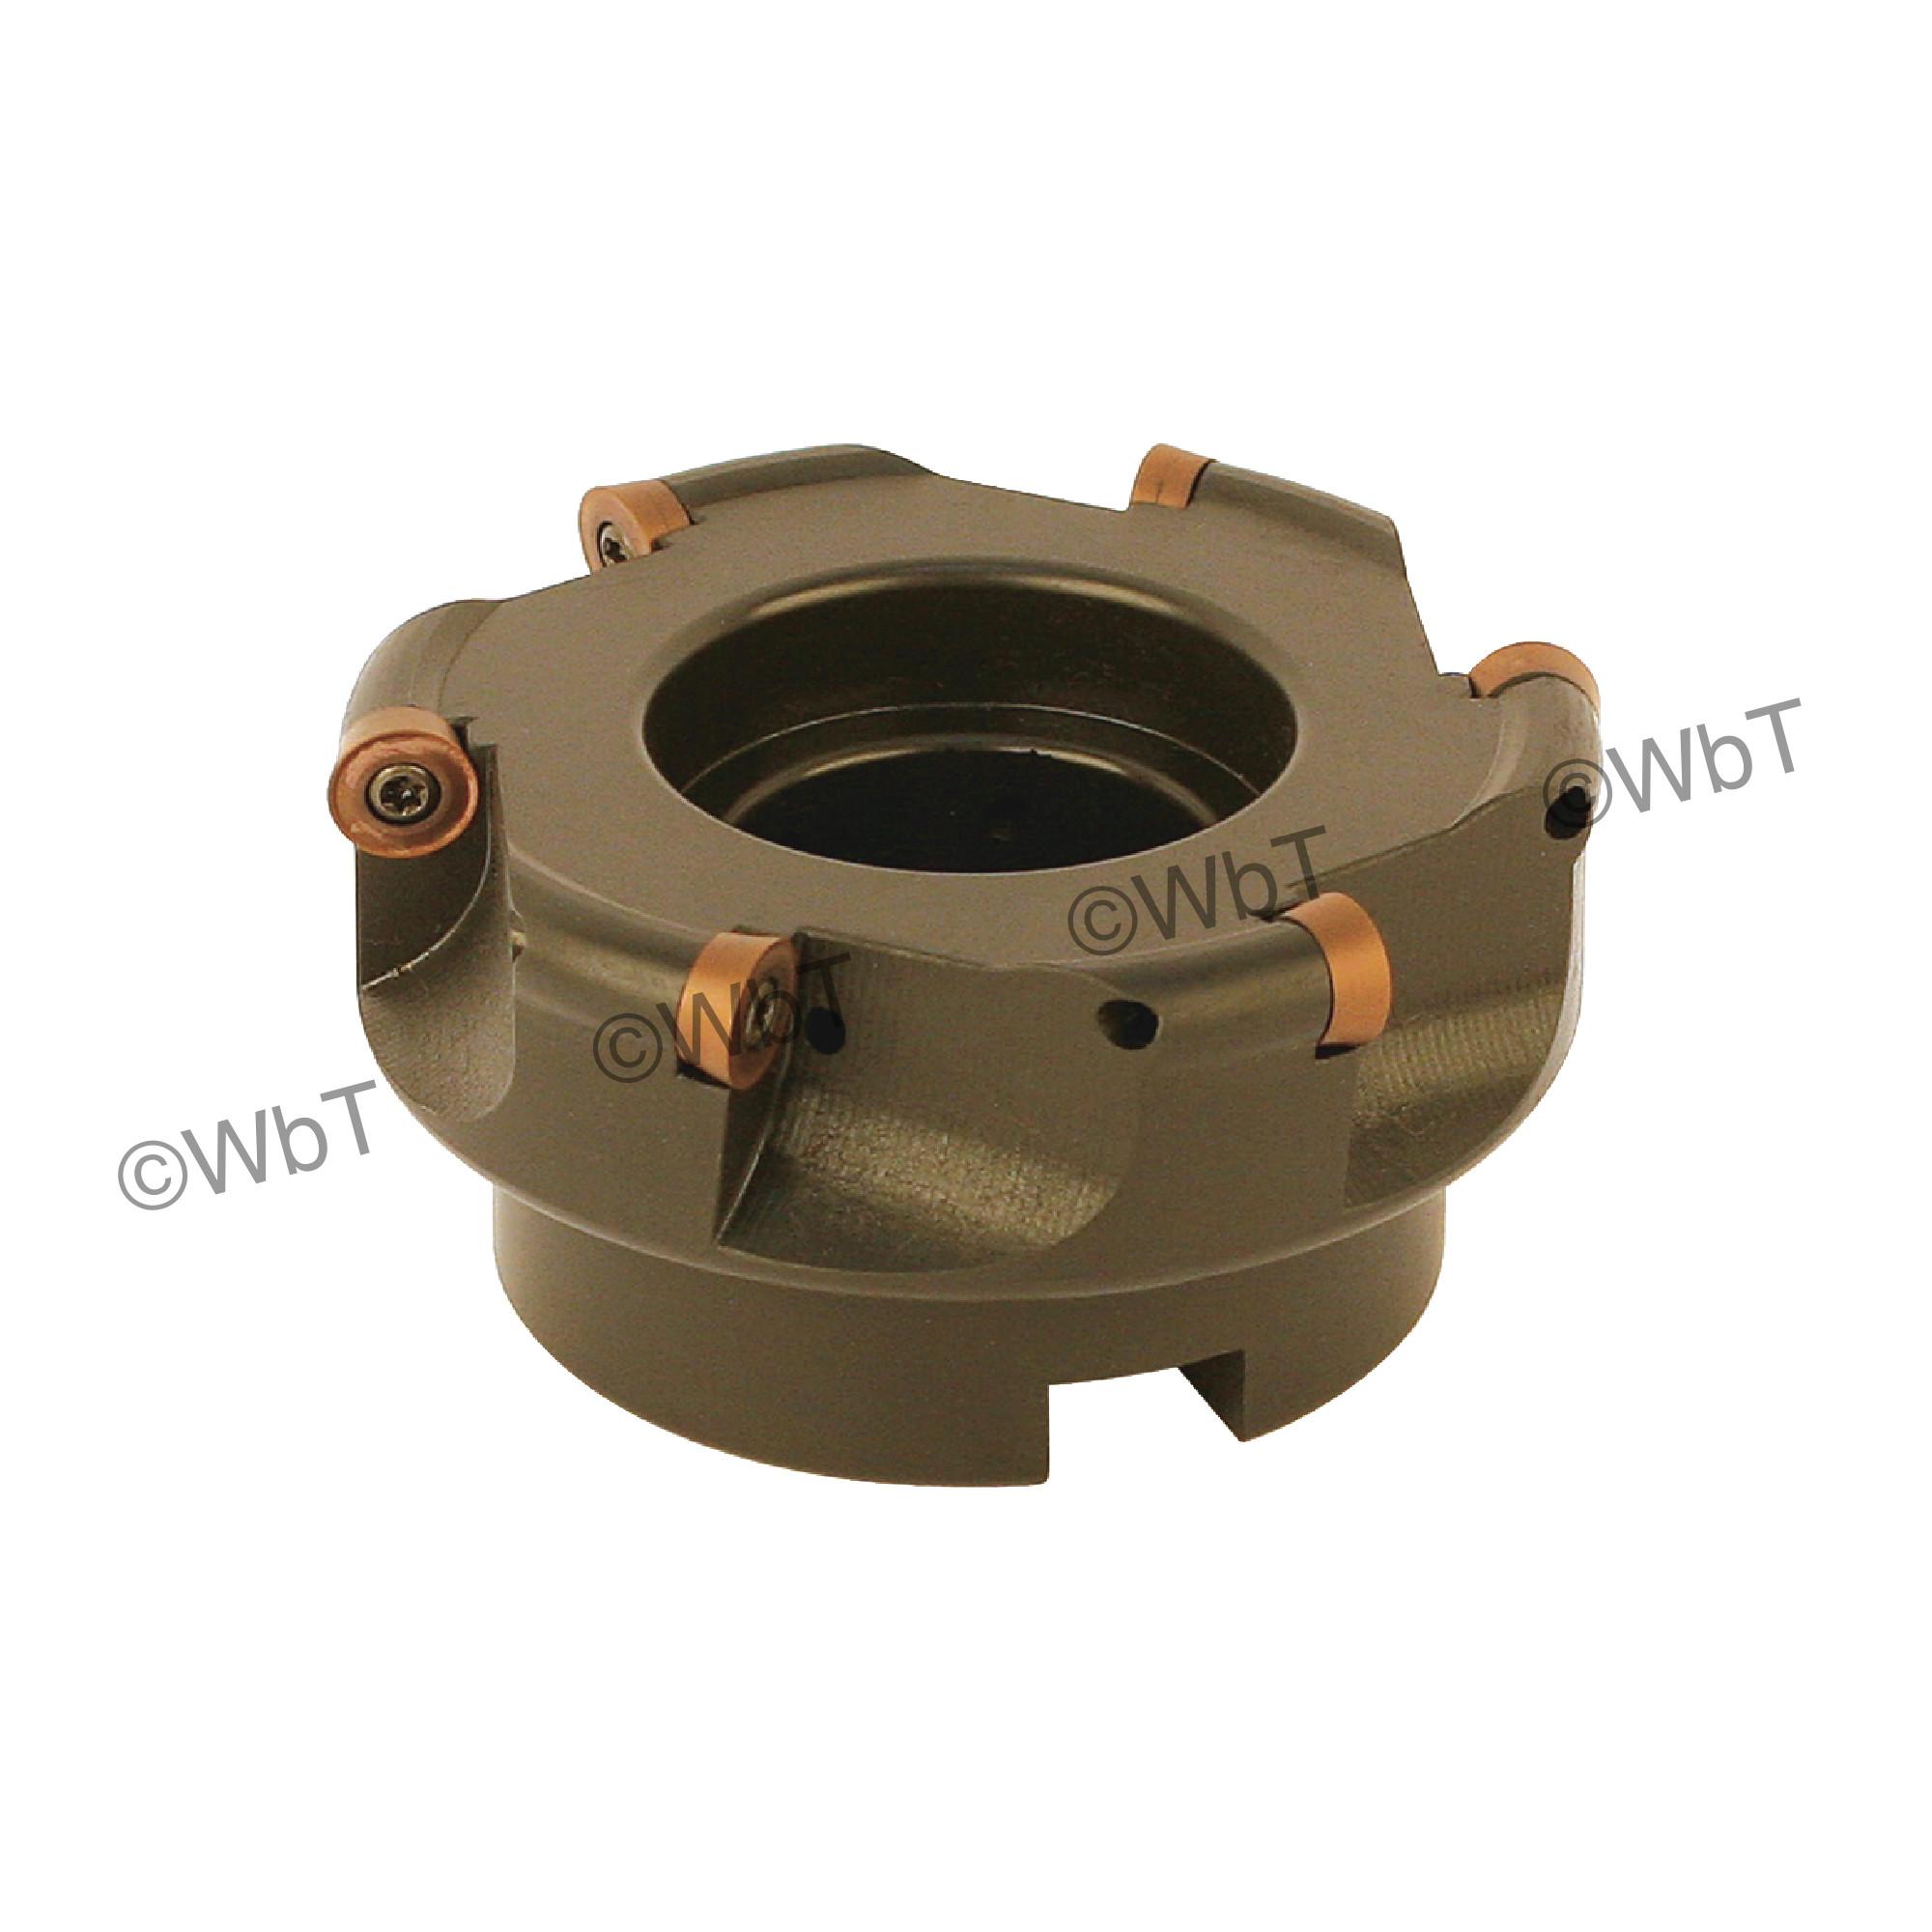 "AKUMA - 4.000"" Face Mill Set / Includes: (1) RPC.43.400R-6 (4.0""ø) & (10) RPMT1204M0S-M1 PM15M Coated Inserts / R"